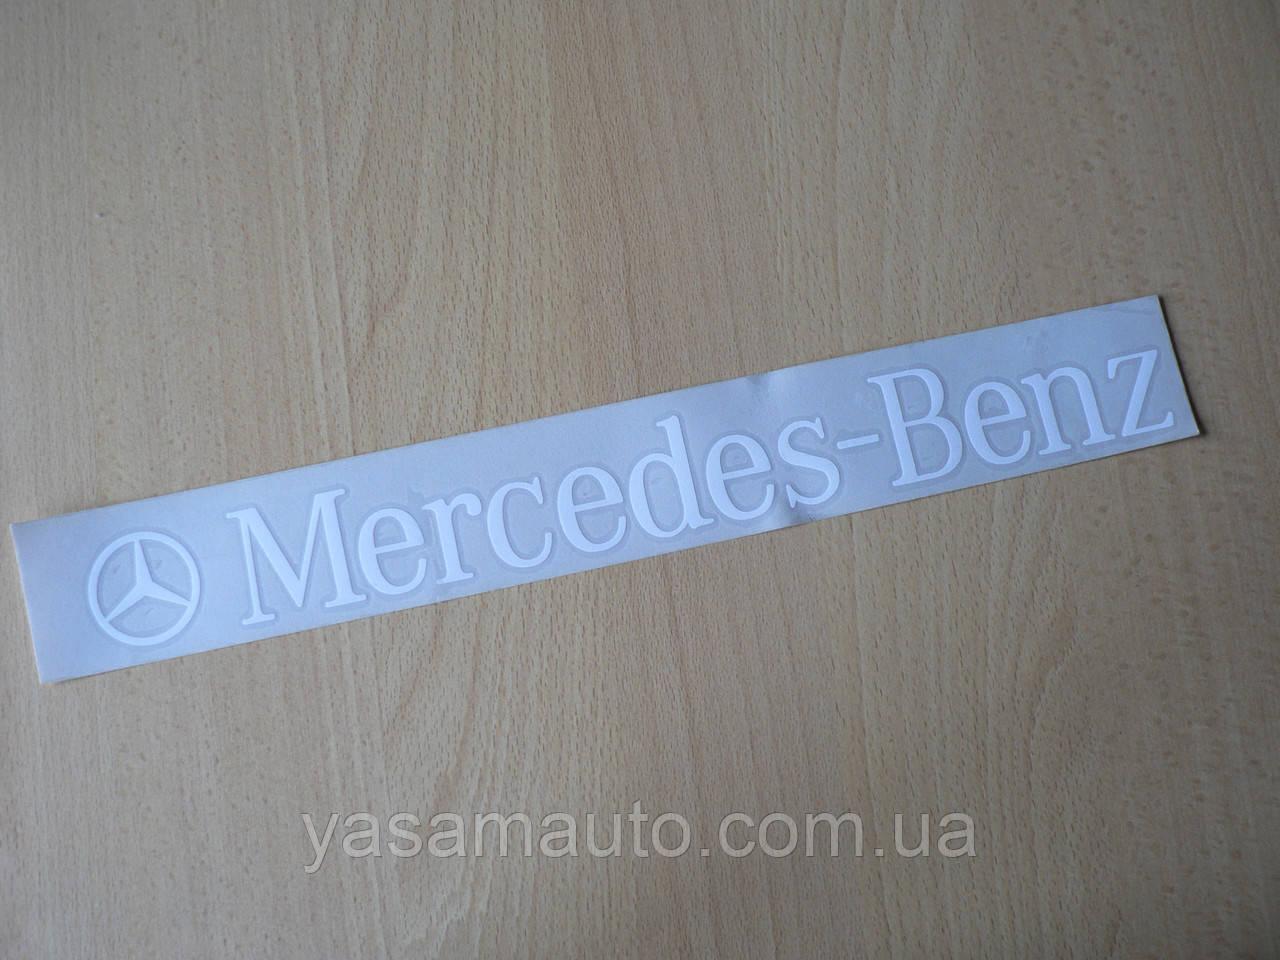 Наклейка vc орнамент задний Mercedes - Benz 335х34мм на авто белая с эмблемой Мерседес Бенц  толстый шрифт